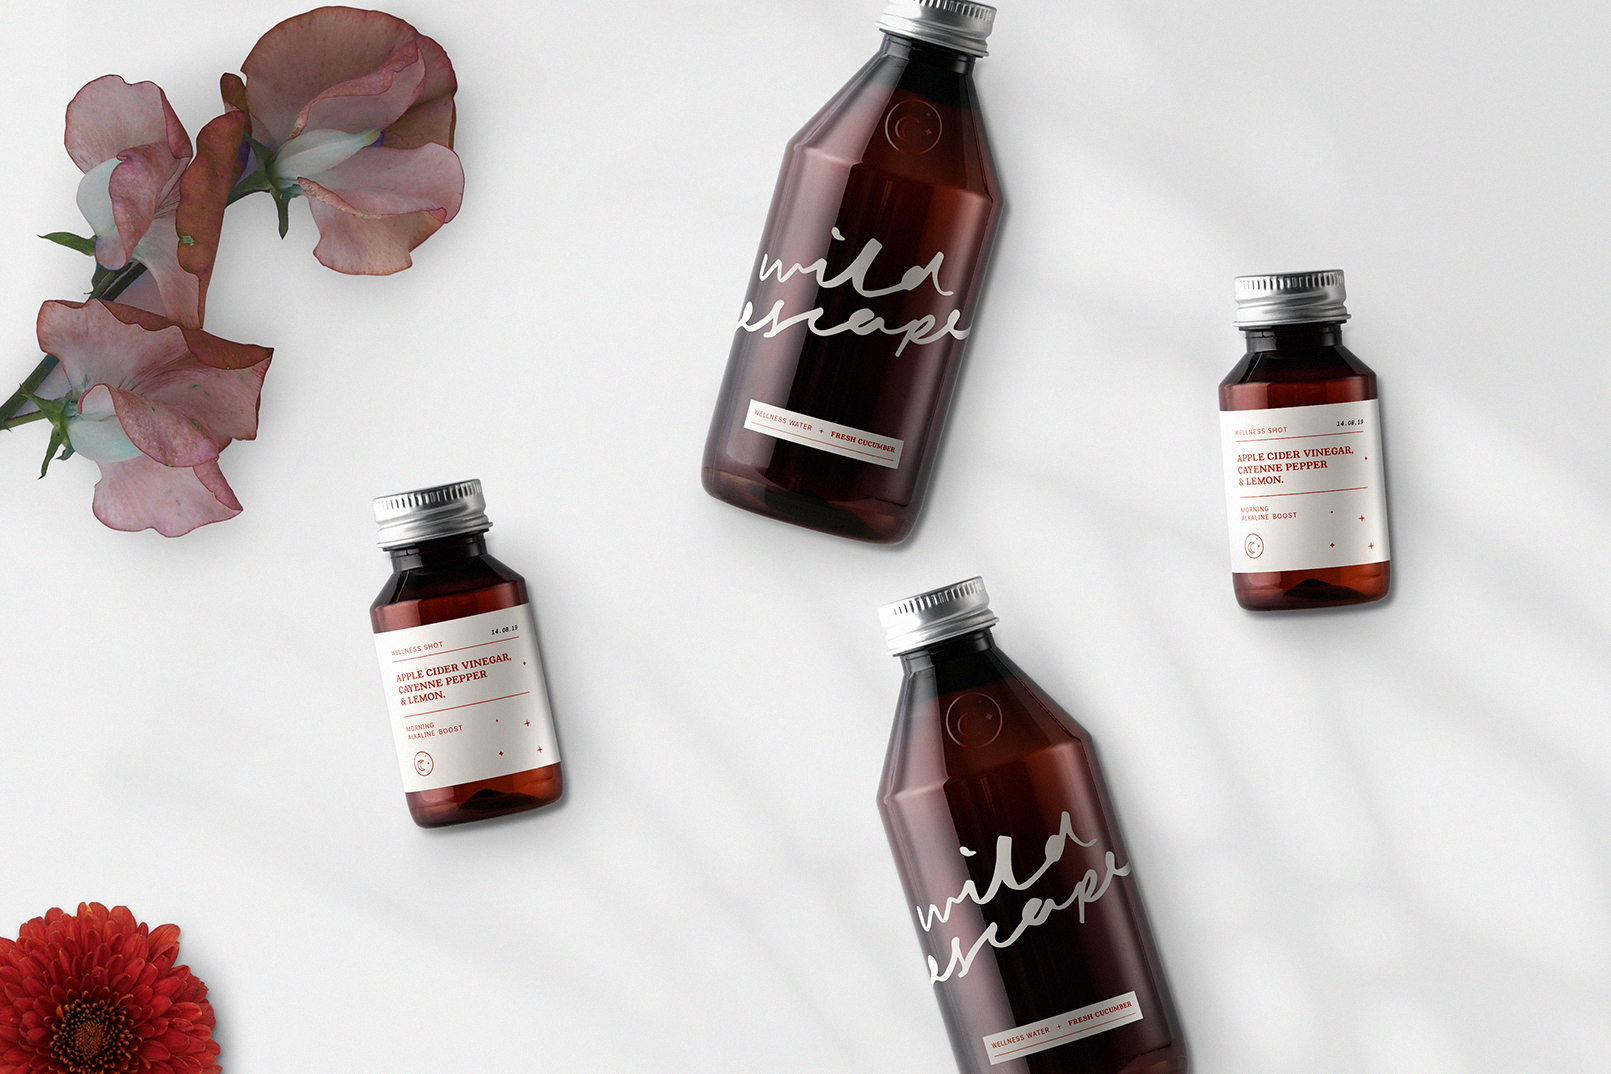 WildEscape-Bottle-Packaging-Design.jpg